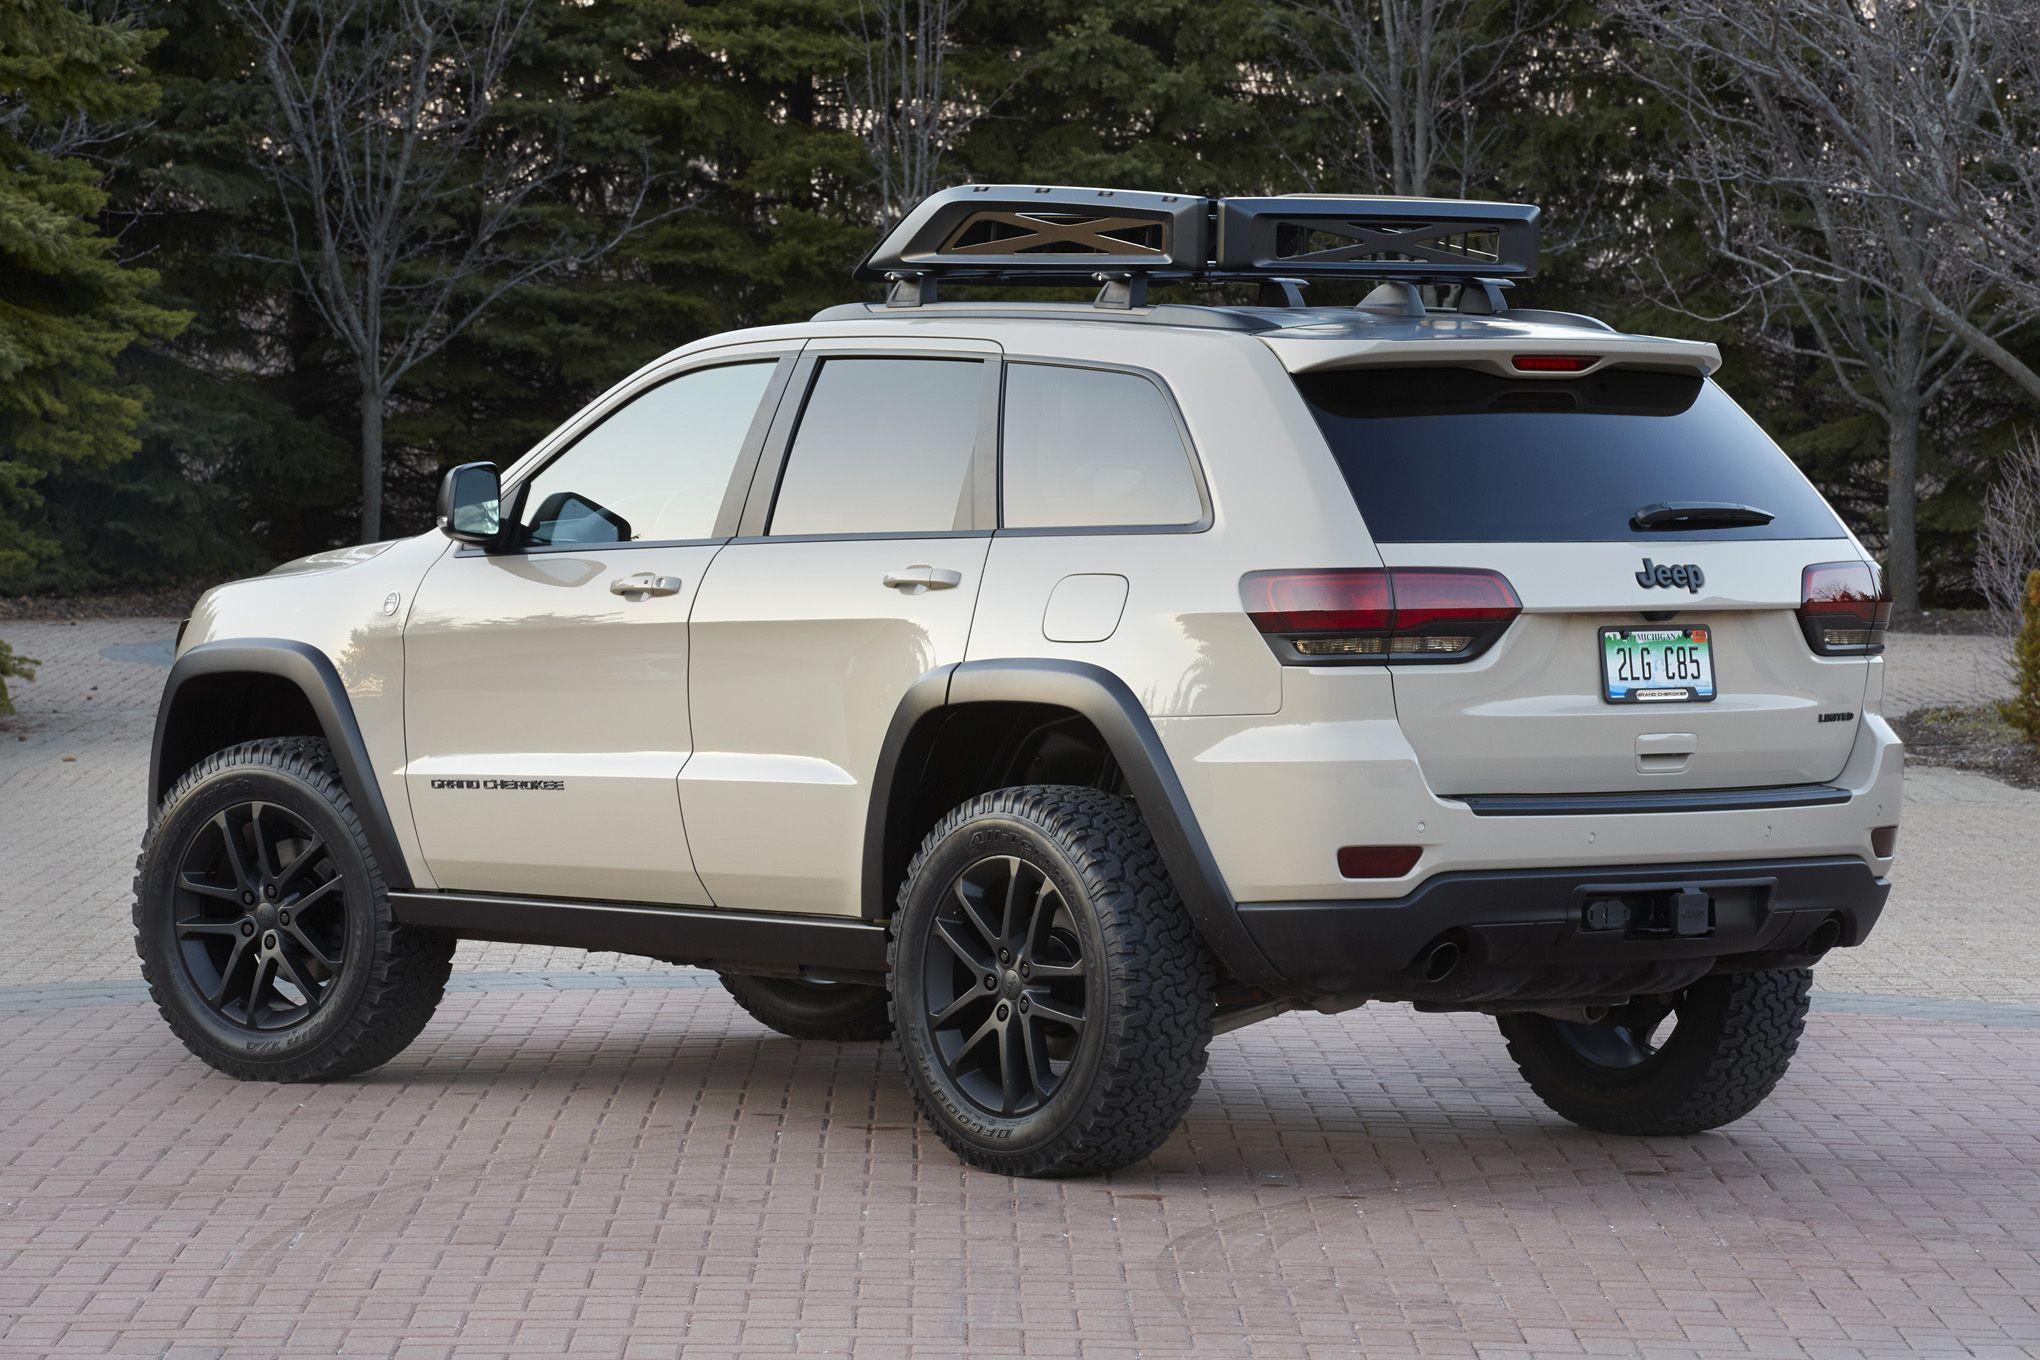 Jeep Grand Cherokee Eco sel Trail Warrior Concept